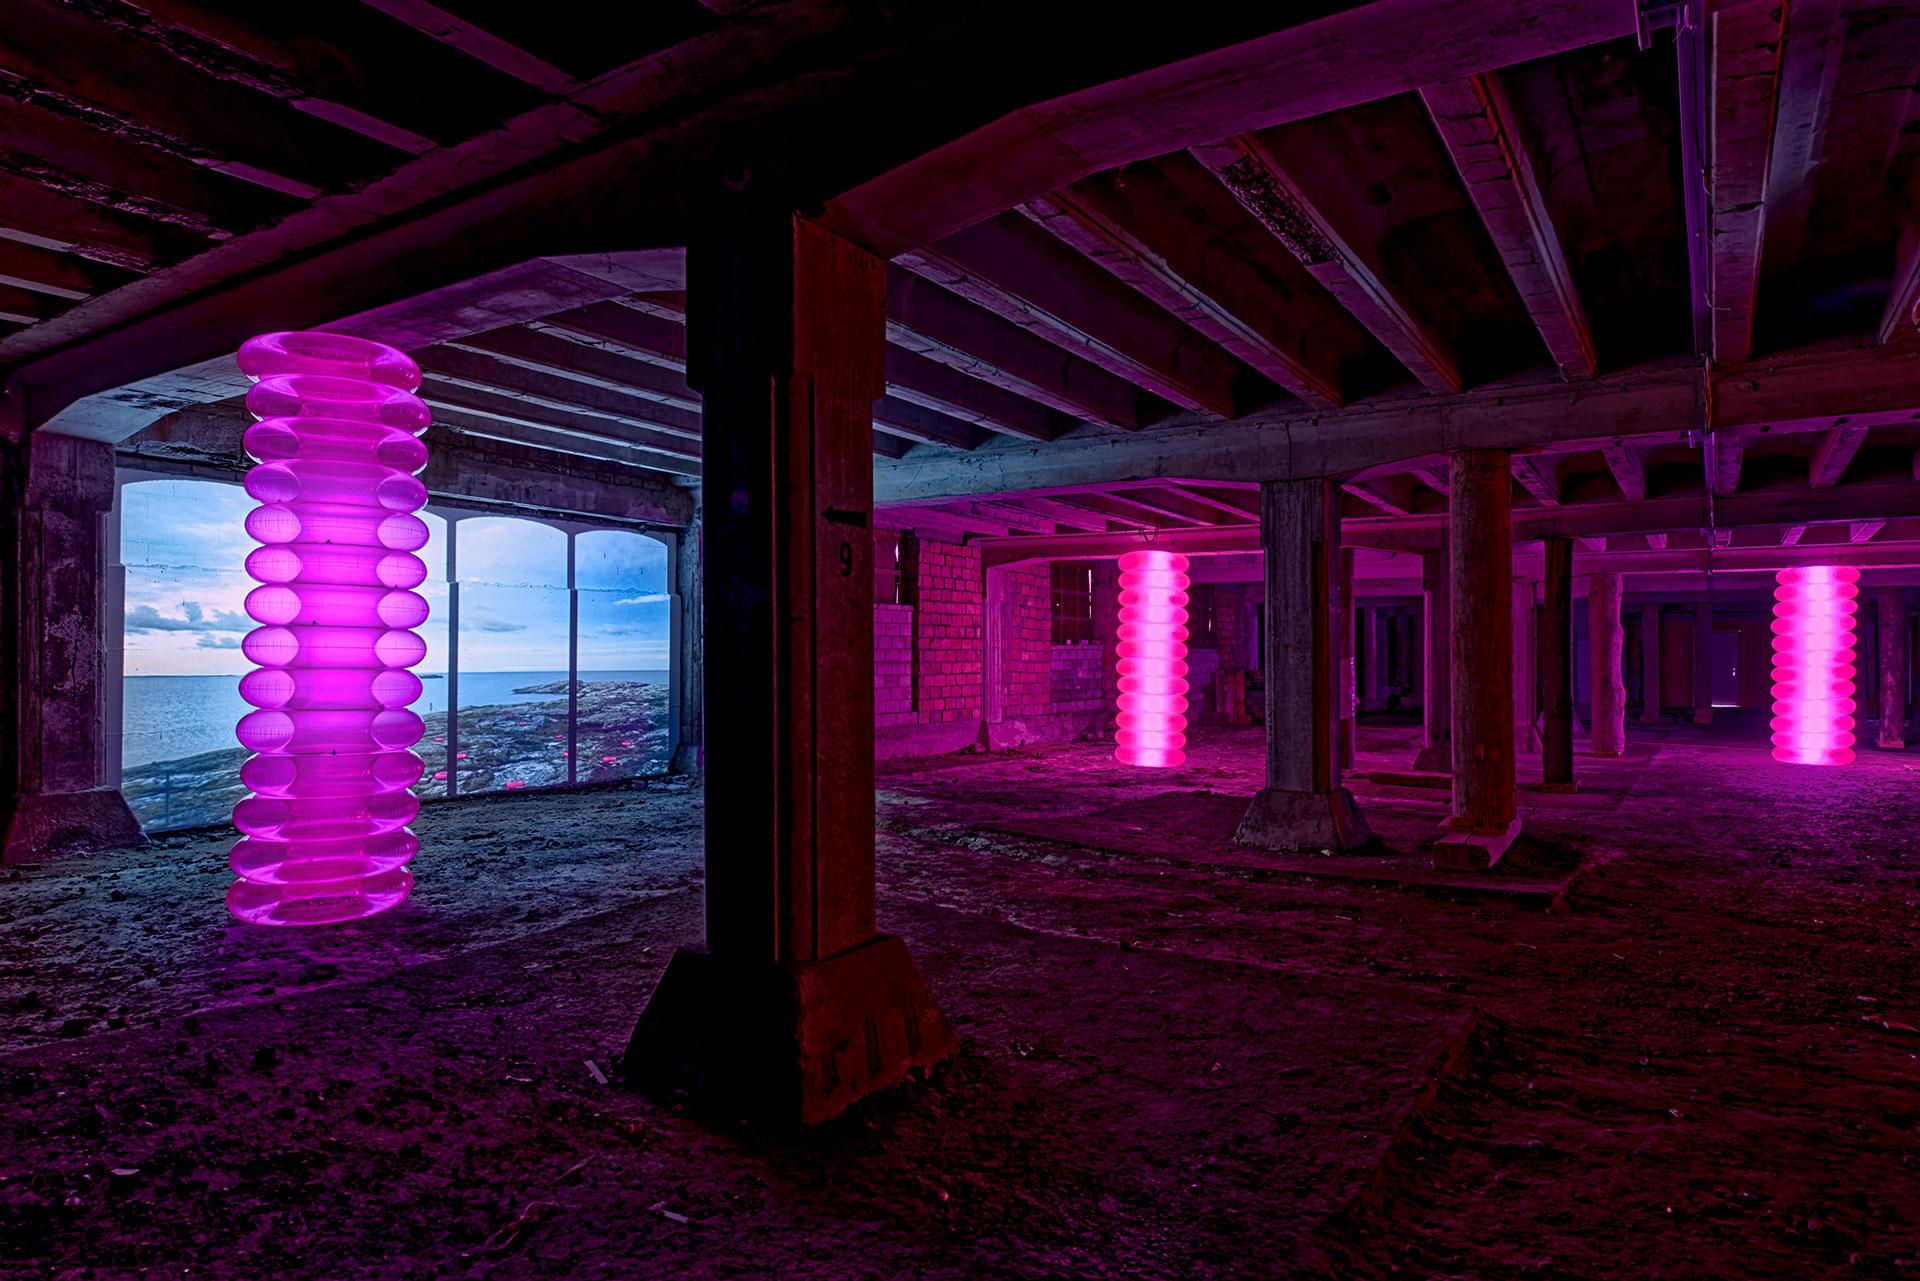 daniel_hausig_leuchttuerme_2013_light_installation